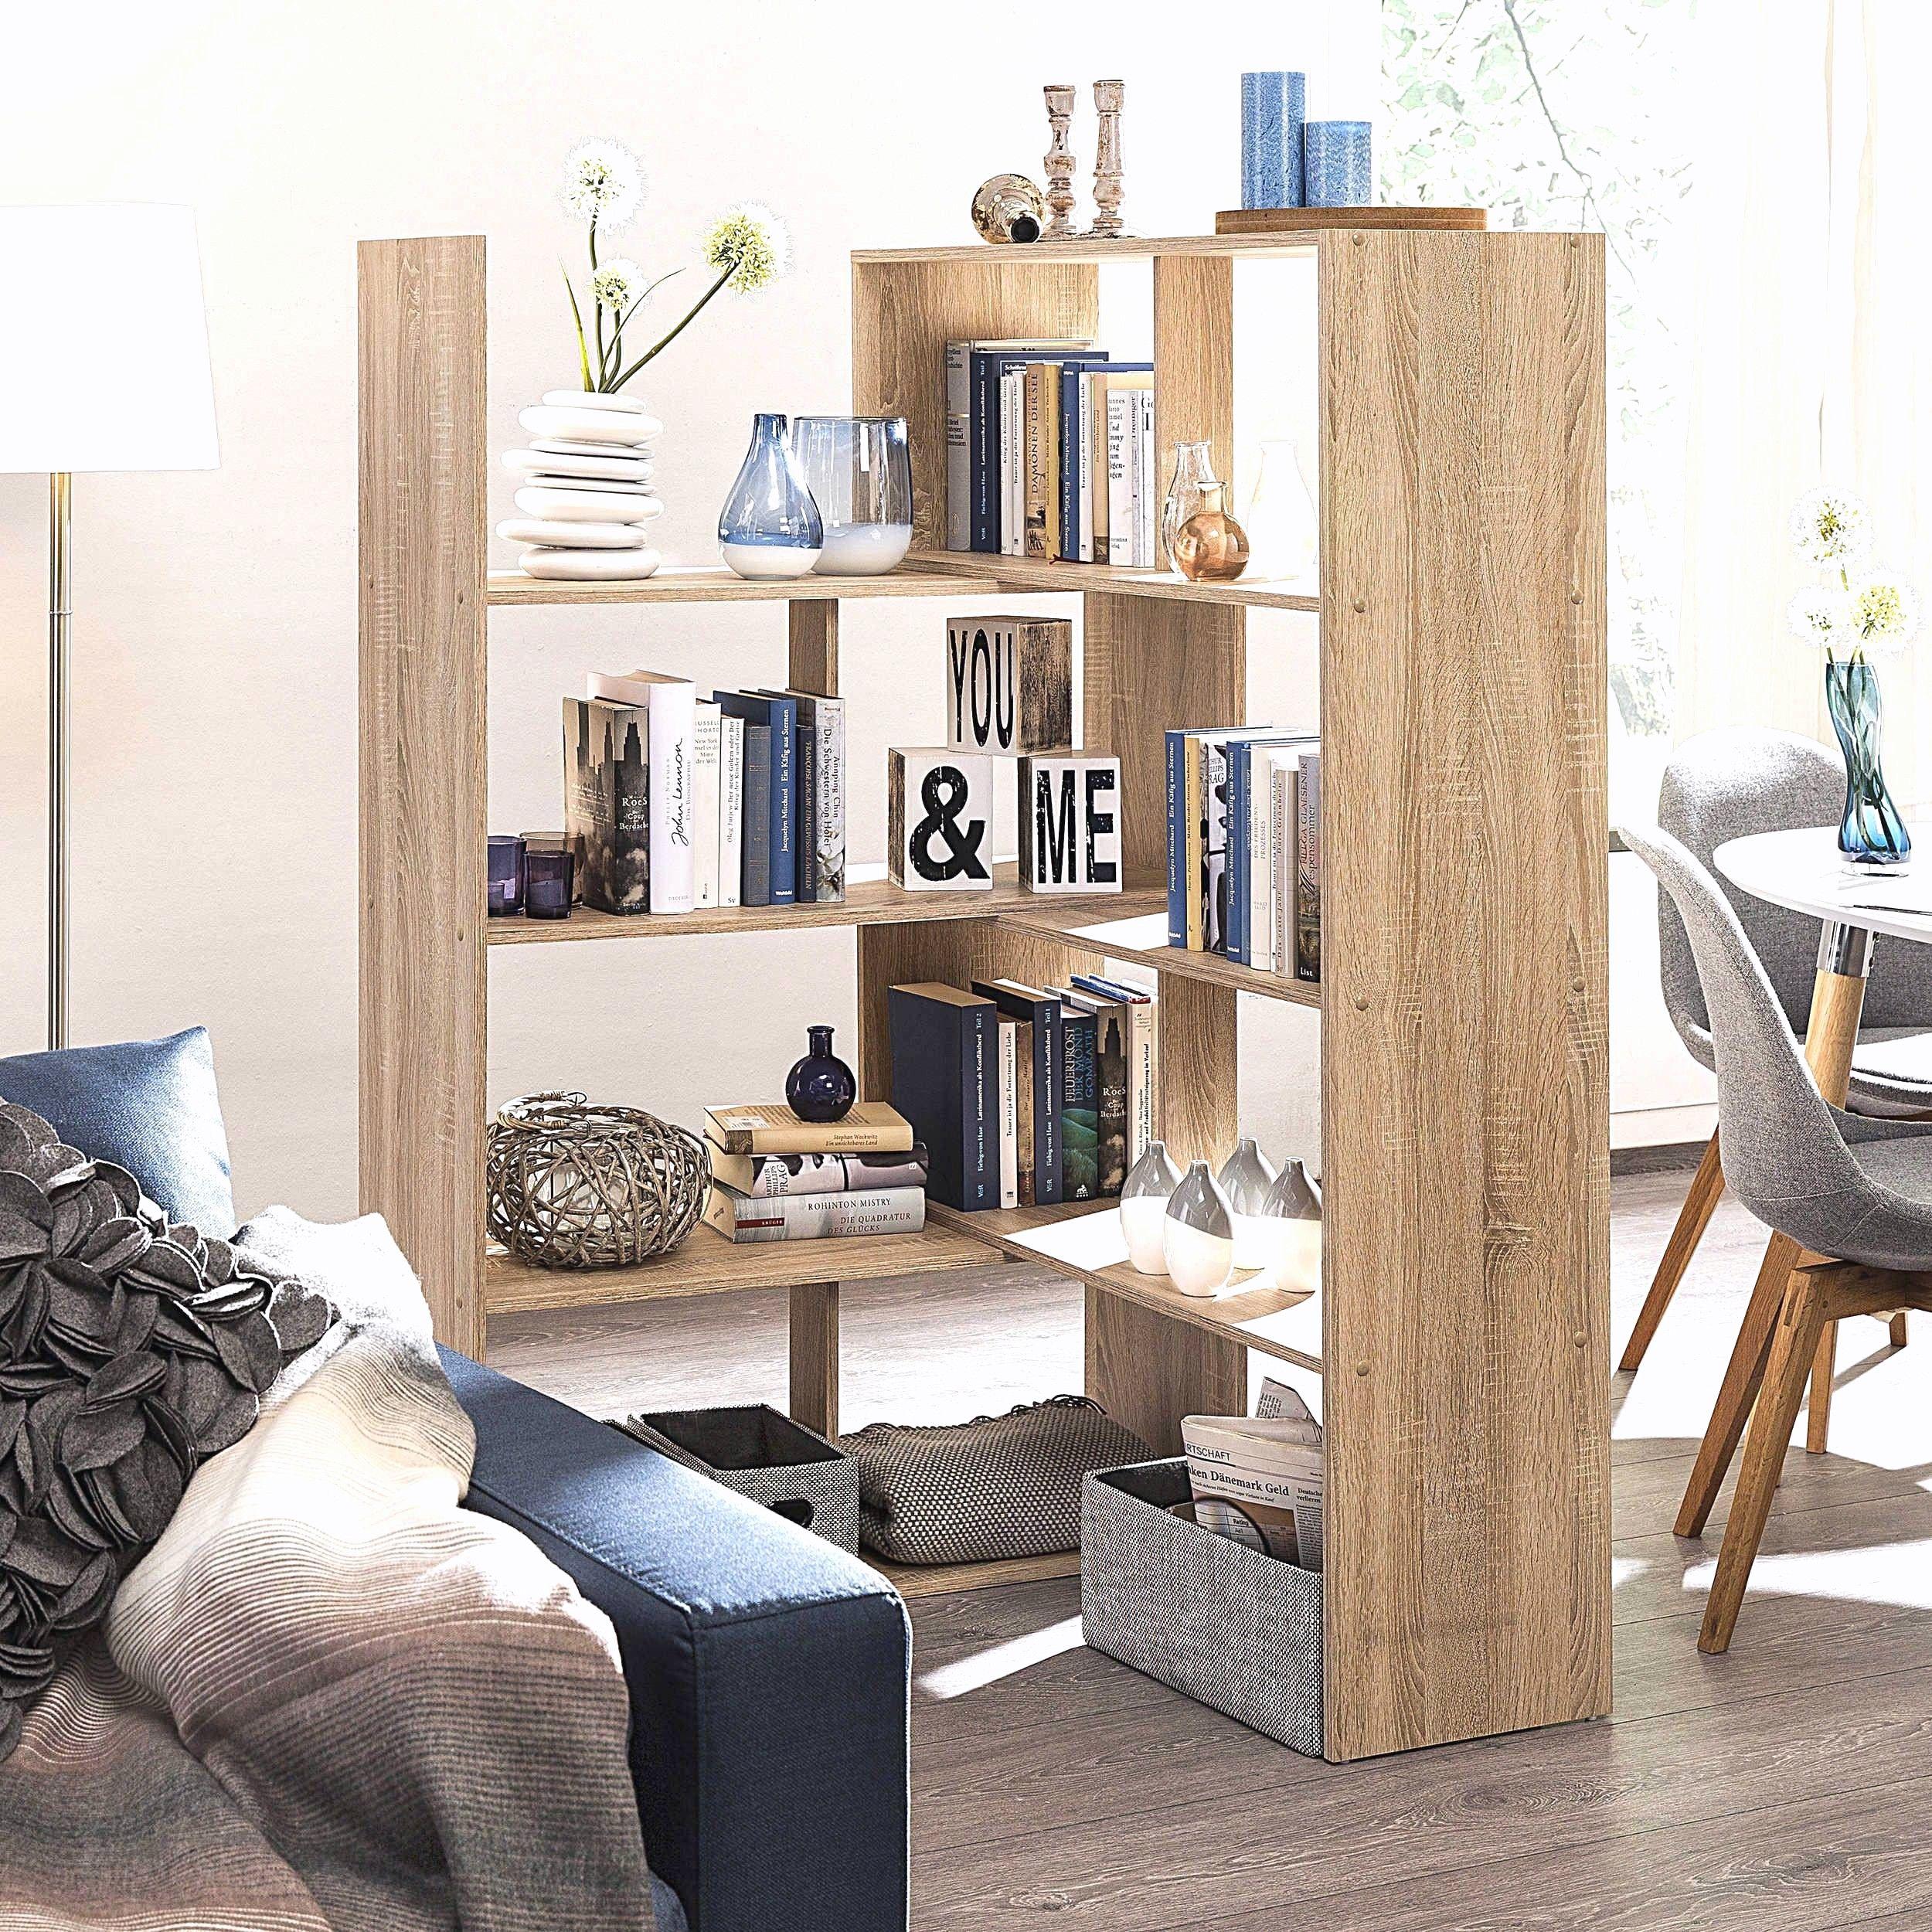 Raumteiler Selber Bauen Ohne Bohren  Home, Home decor, House styles